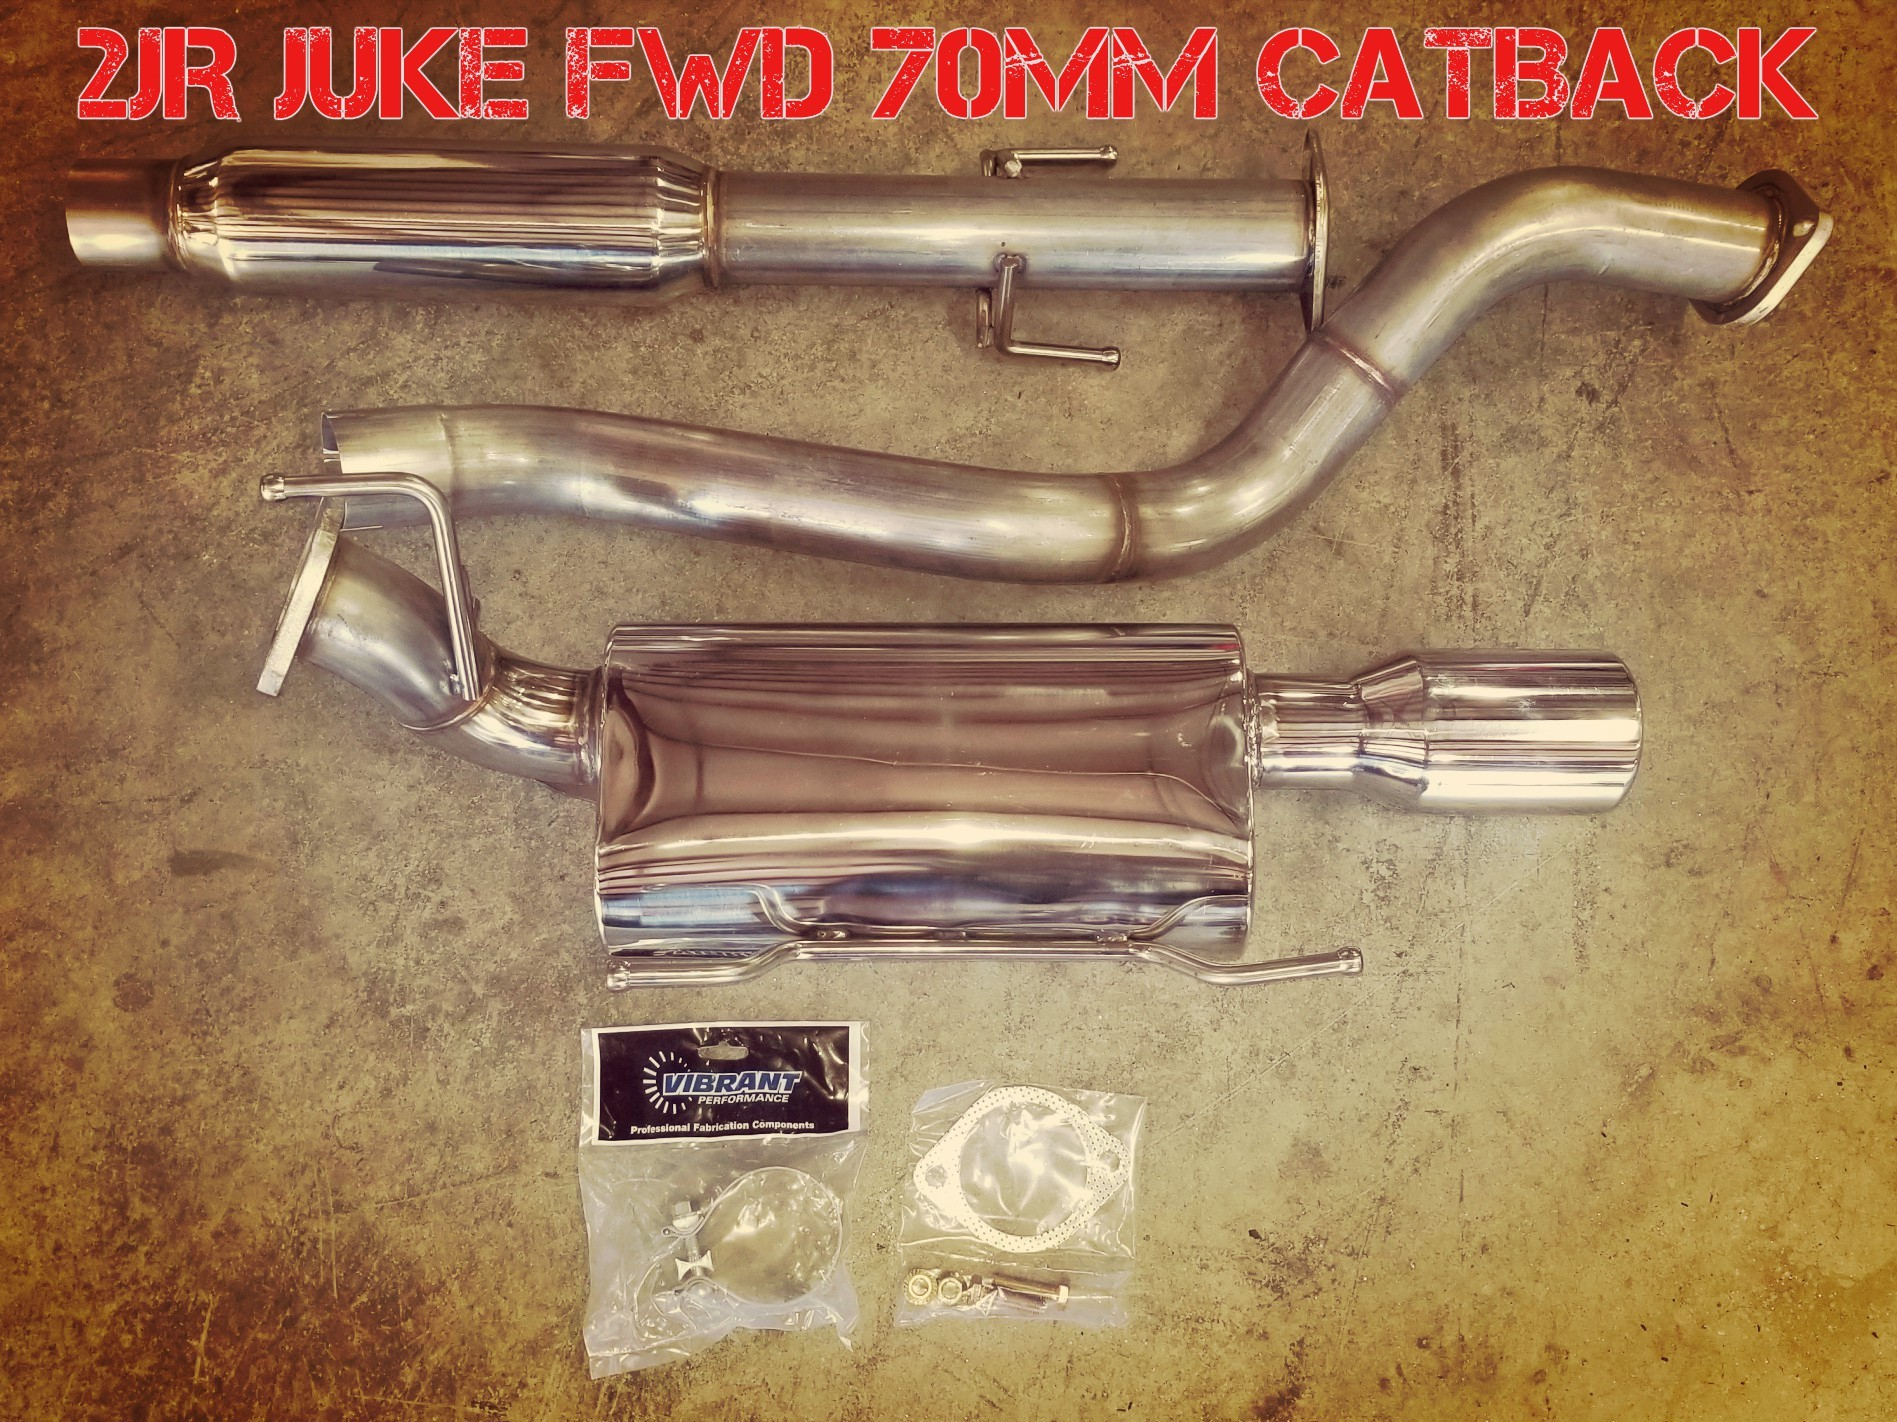 2JR FWD Juke 70mm Stainless Catback Exhaust